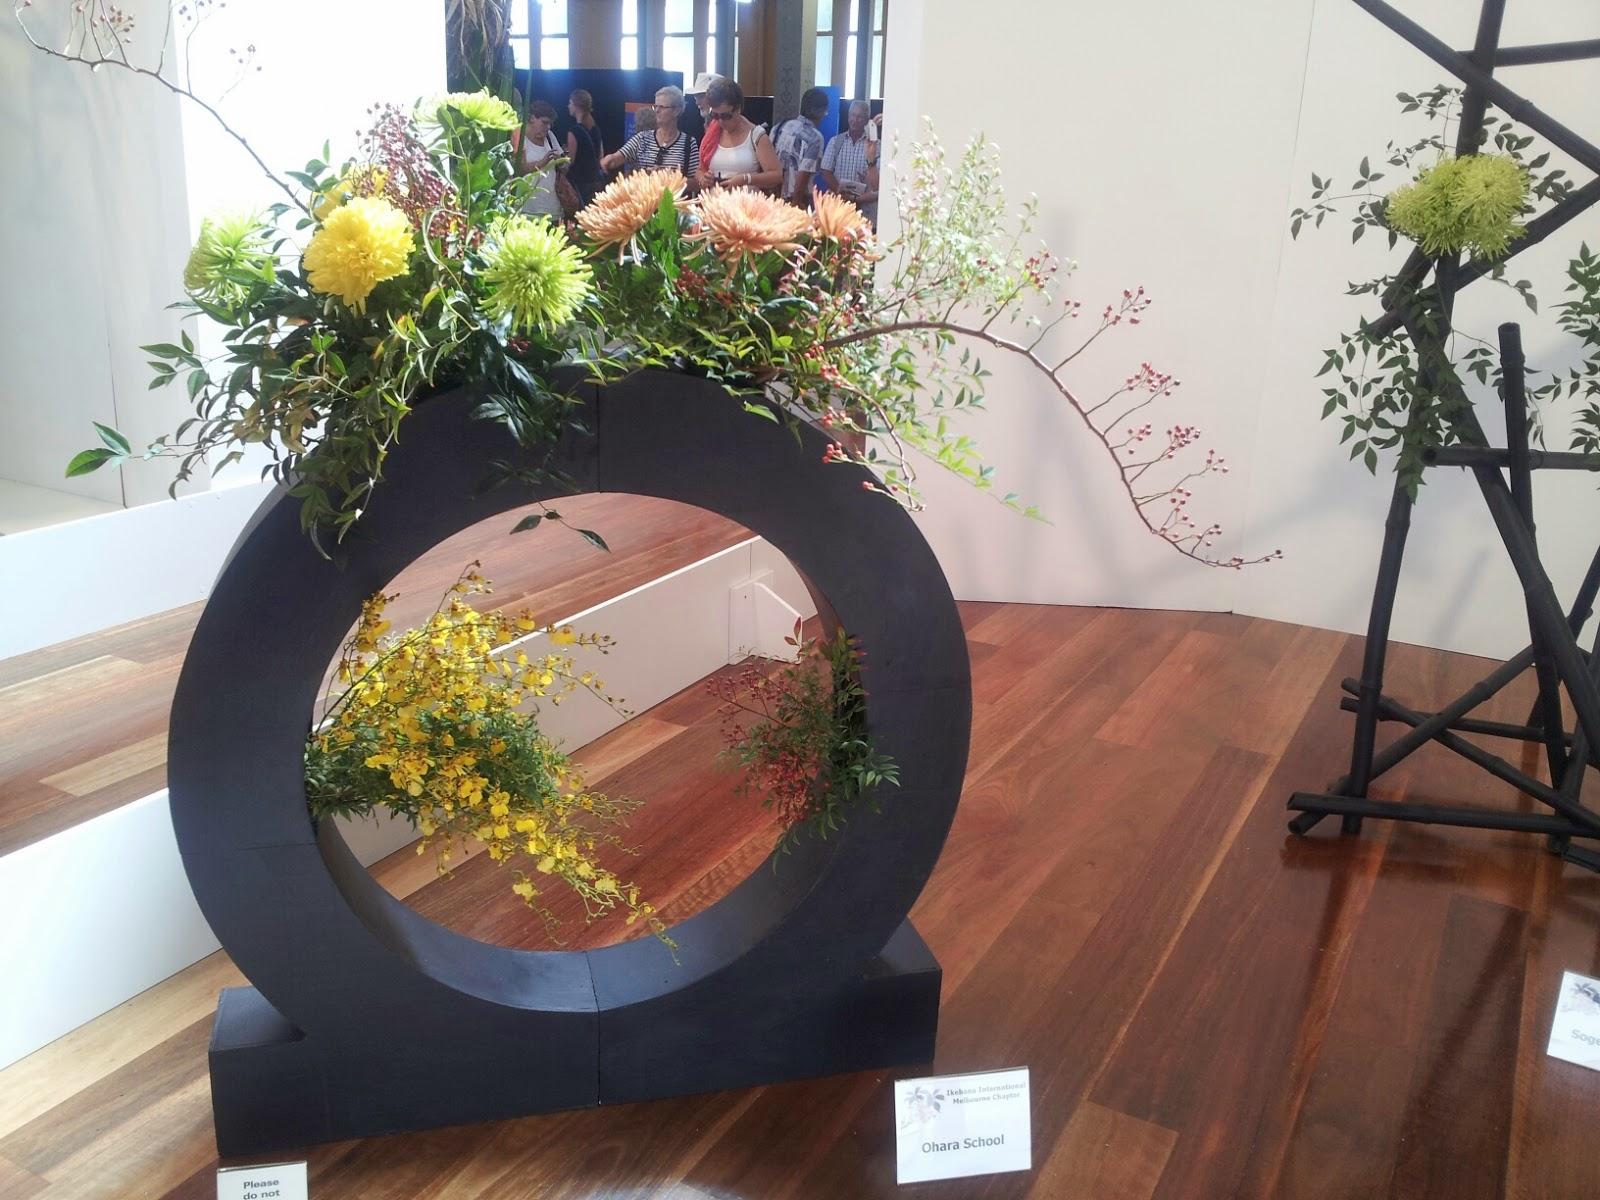 Ikebana Melbourne The 2014 Melbourne International Flower and Garden Show